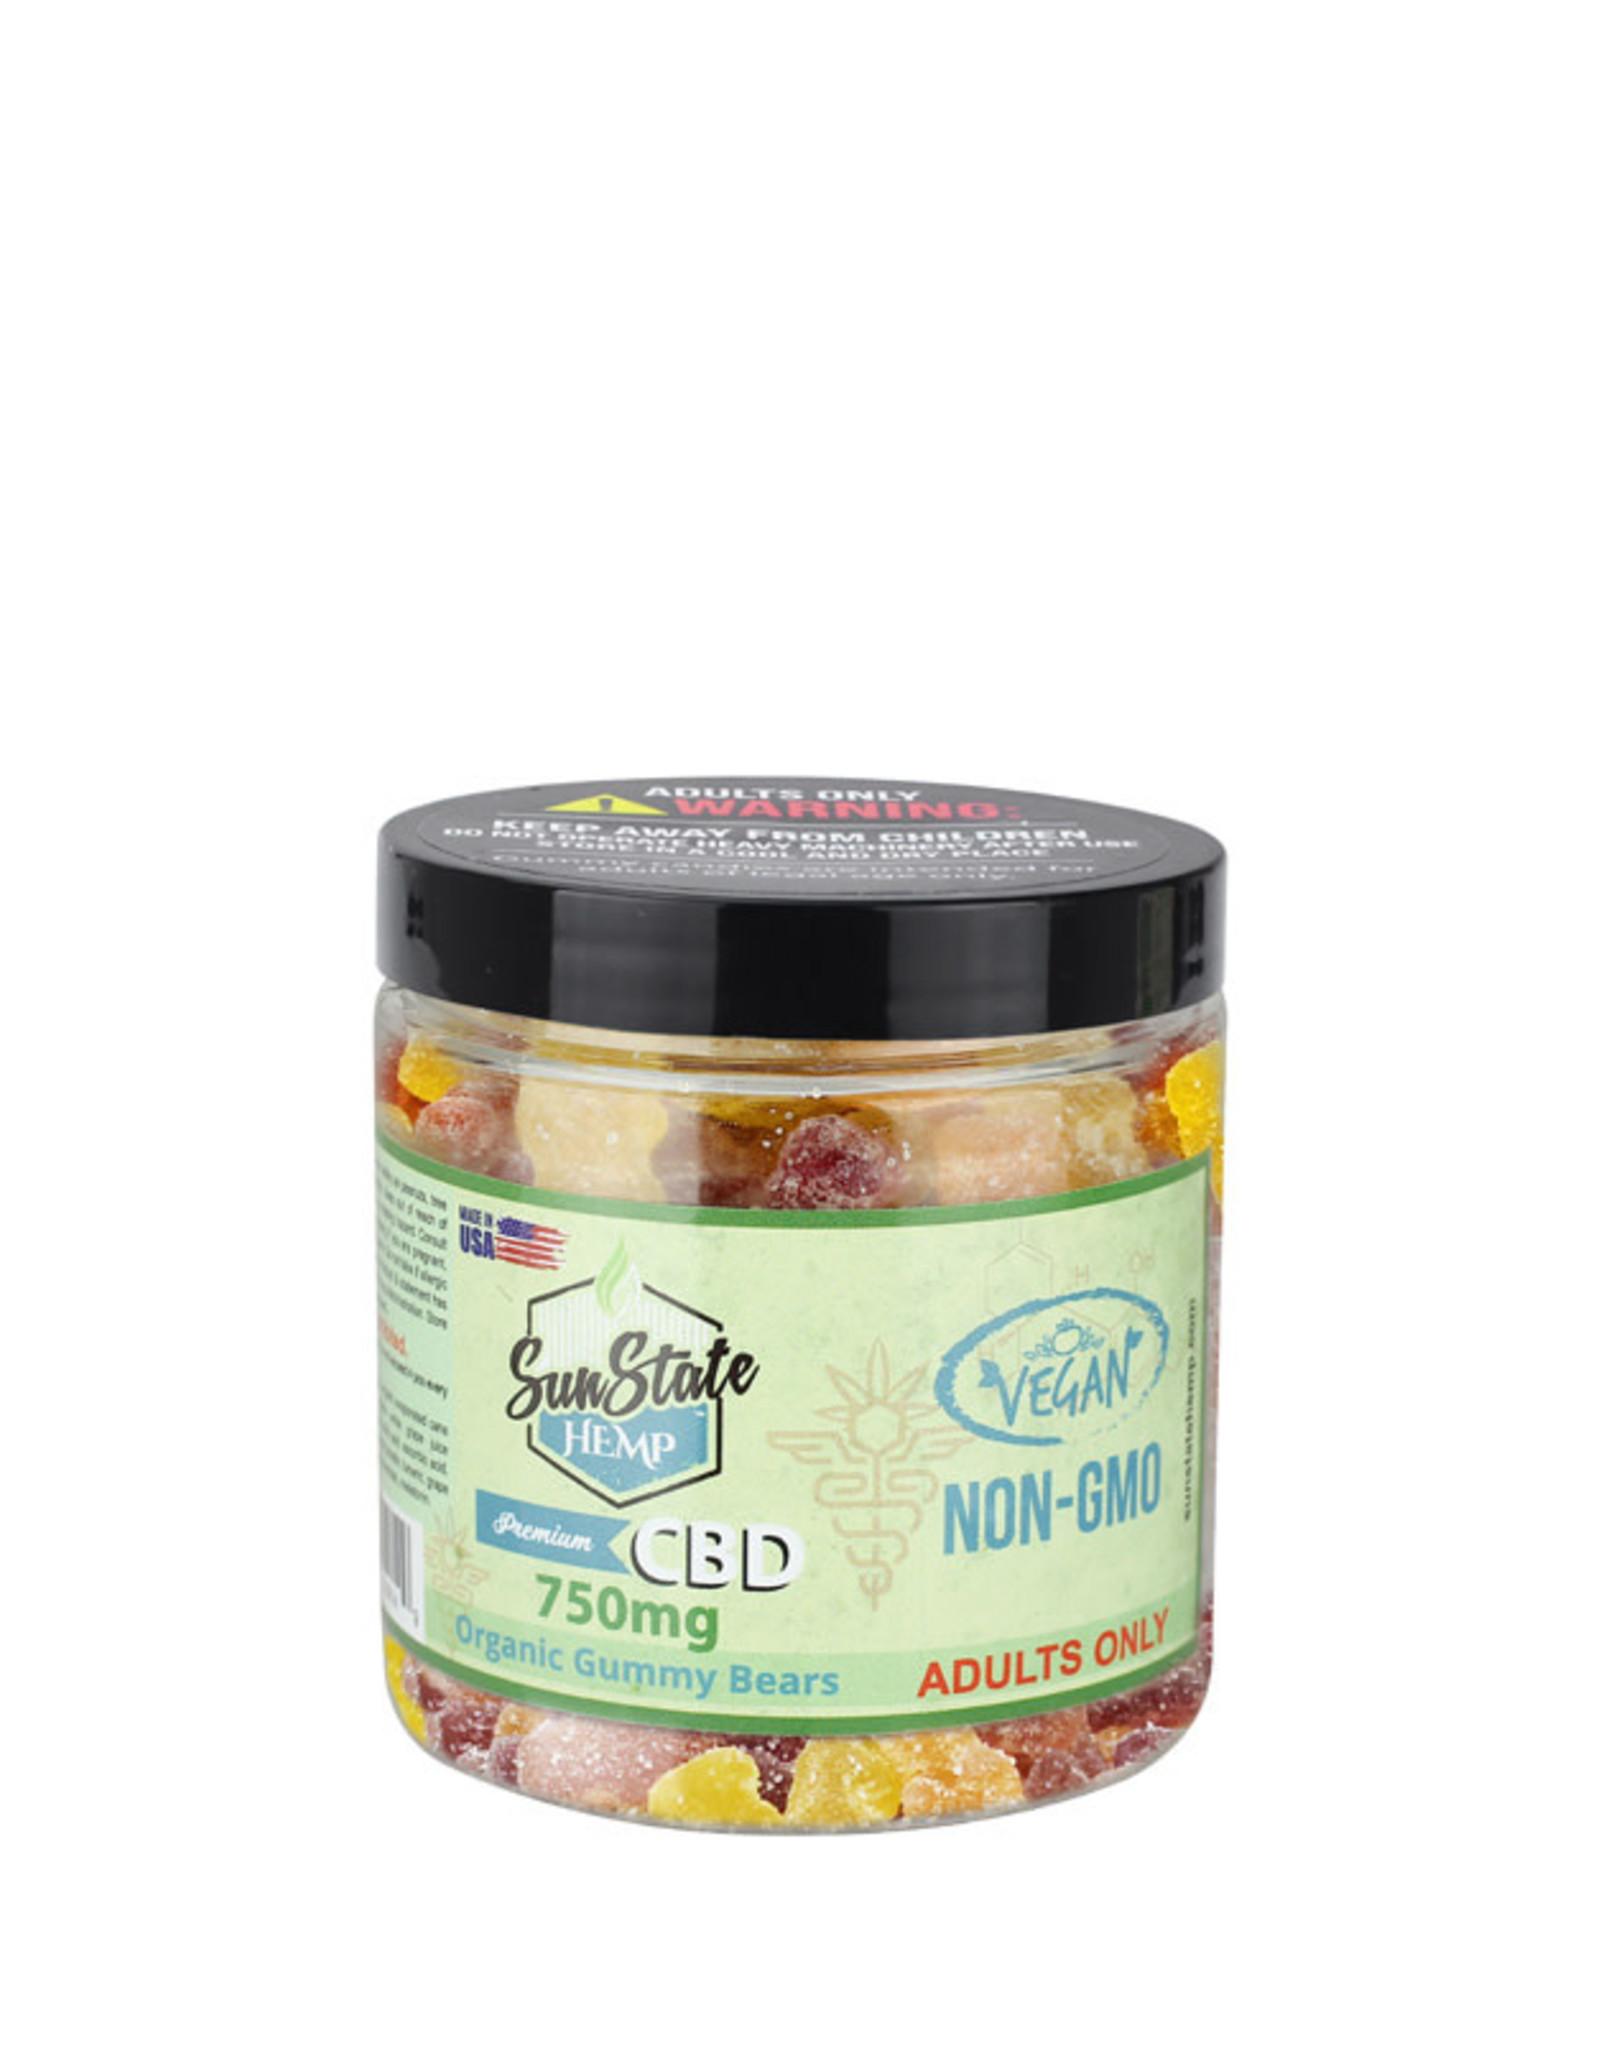 SunState Organic Gummy Bears